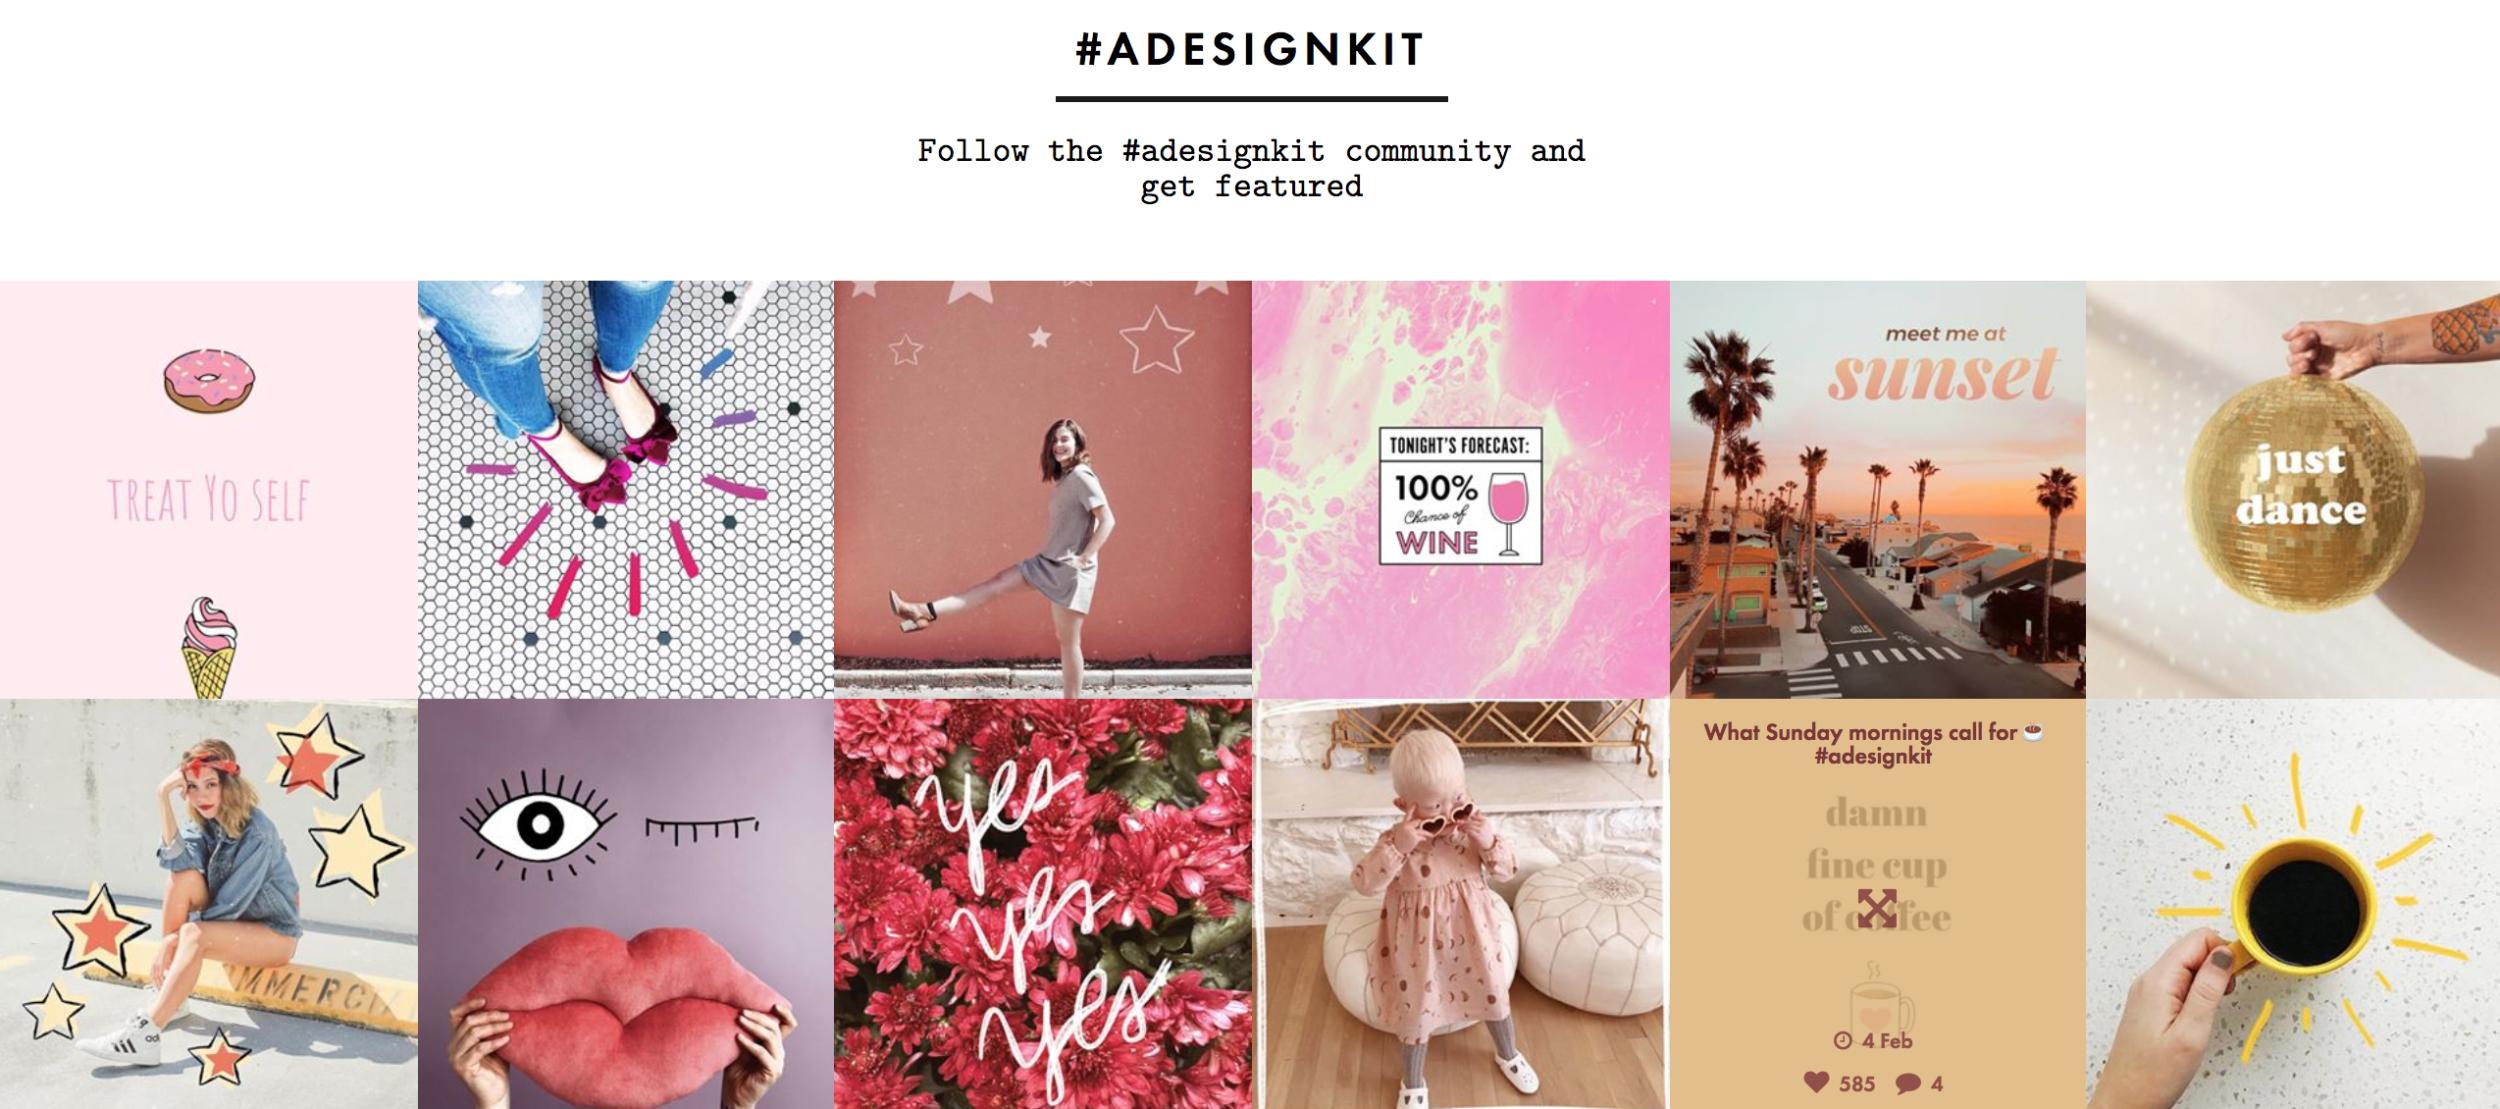 Instagram Apps for Business - Sked Social